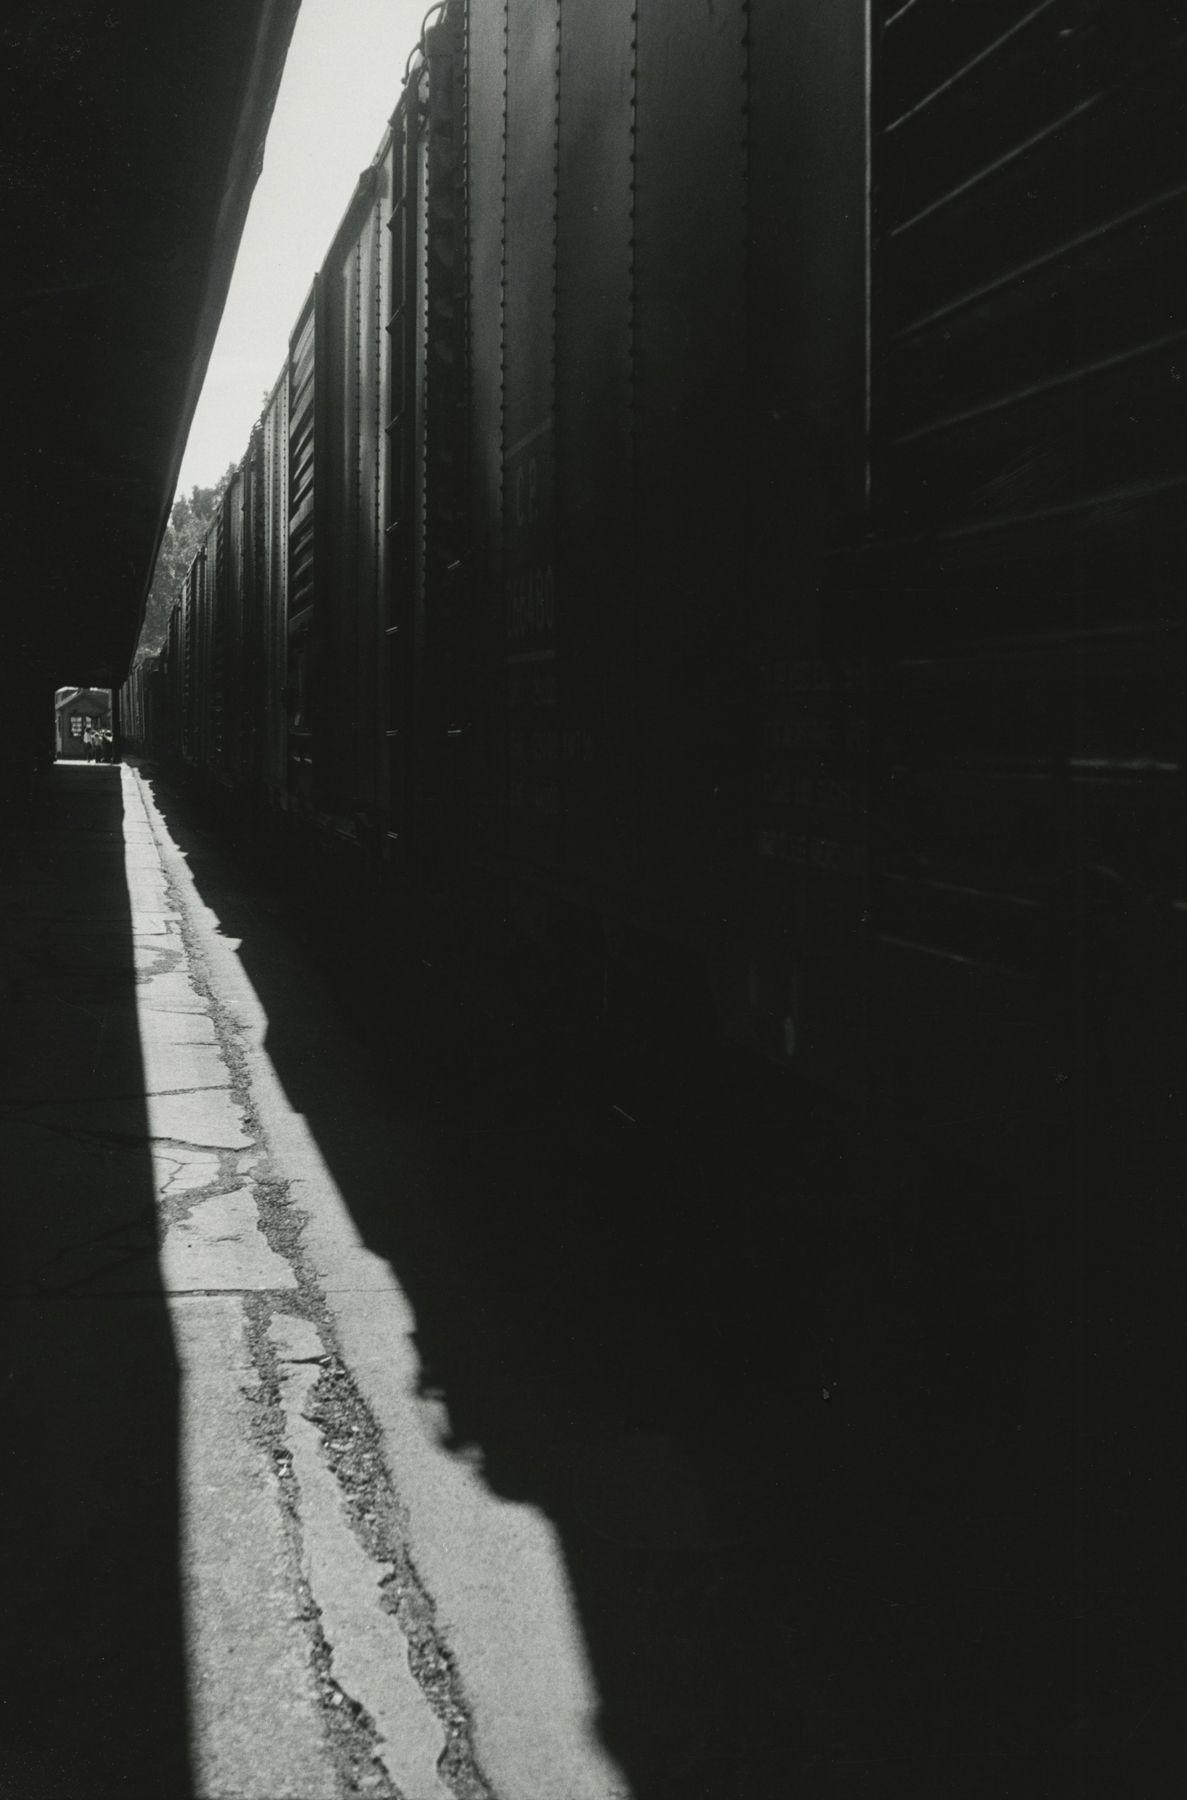 Louis Stettner - Untitled (Train), 1950 - Howard Greenberg Gallery